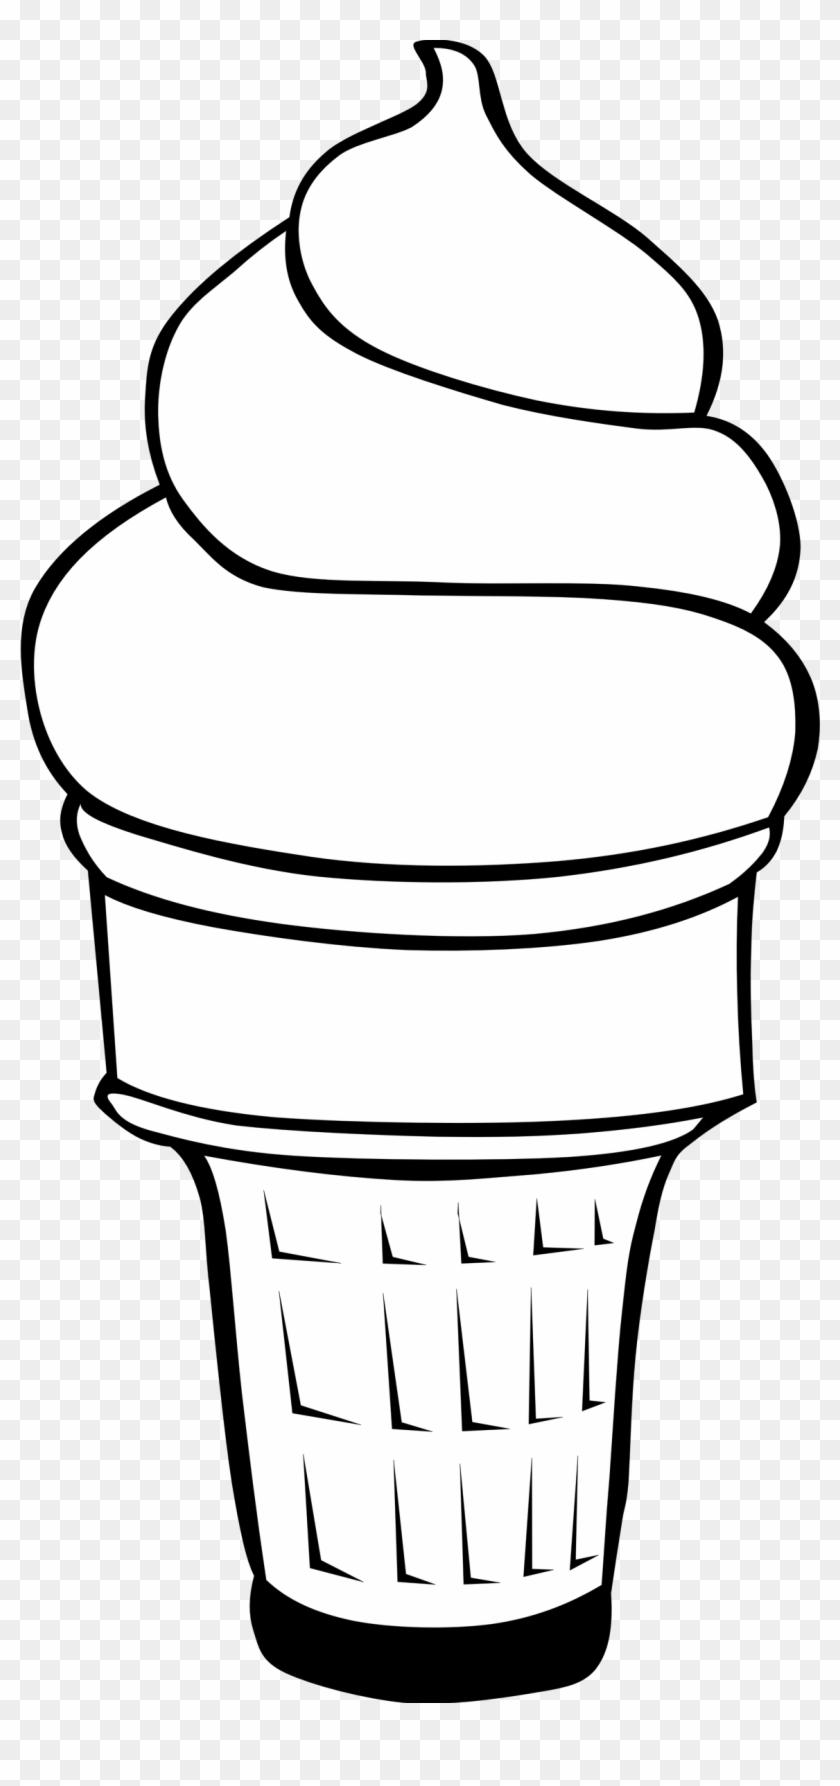 Fast Food, Desserts, Ice Cream Cones, Soft Serve - Ice Cream Cone Clip Art #68150